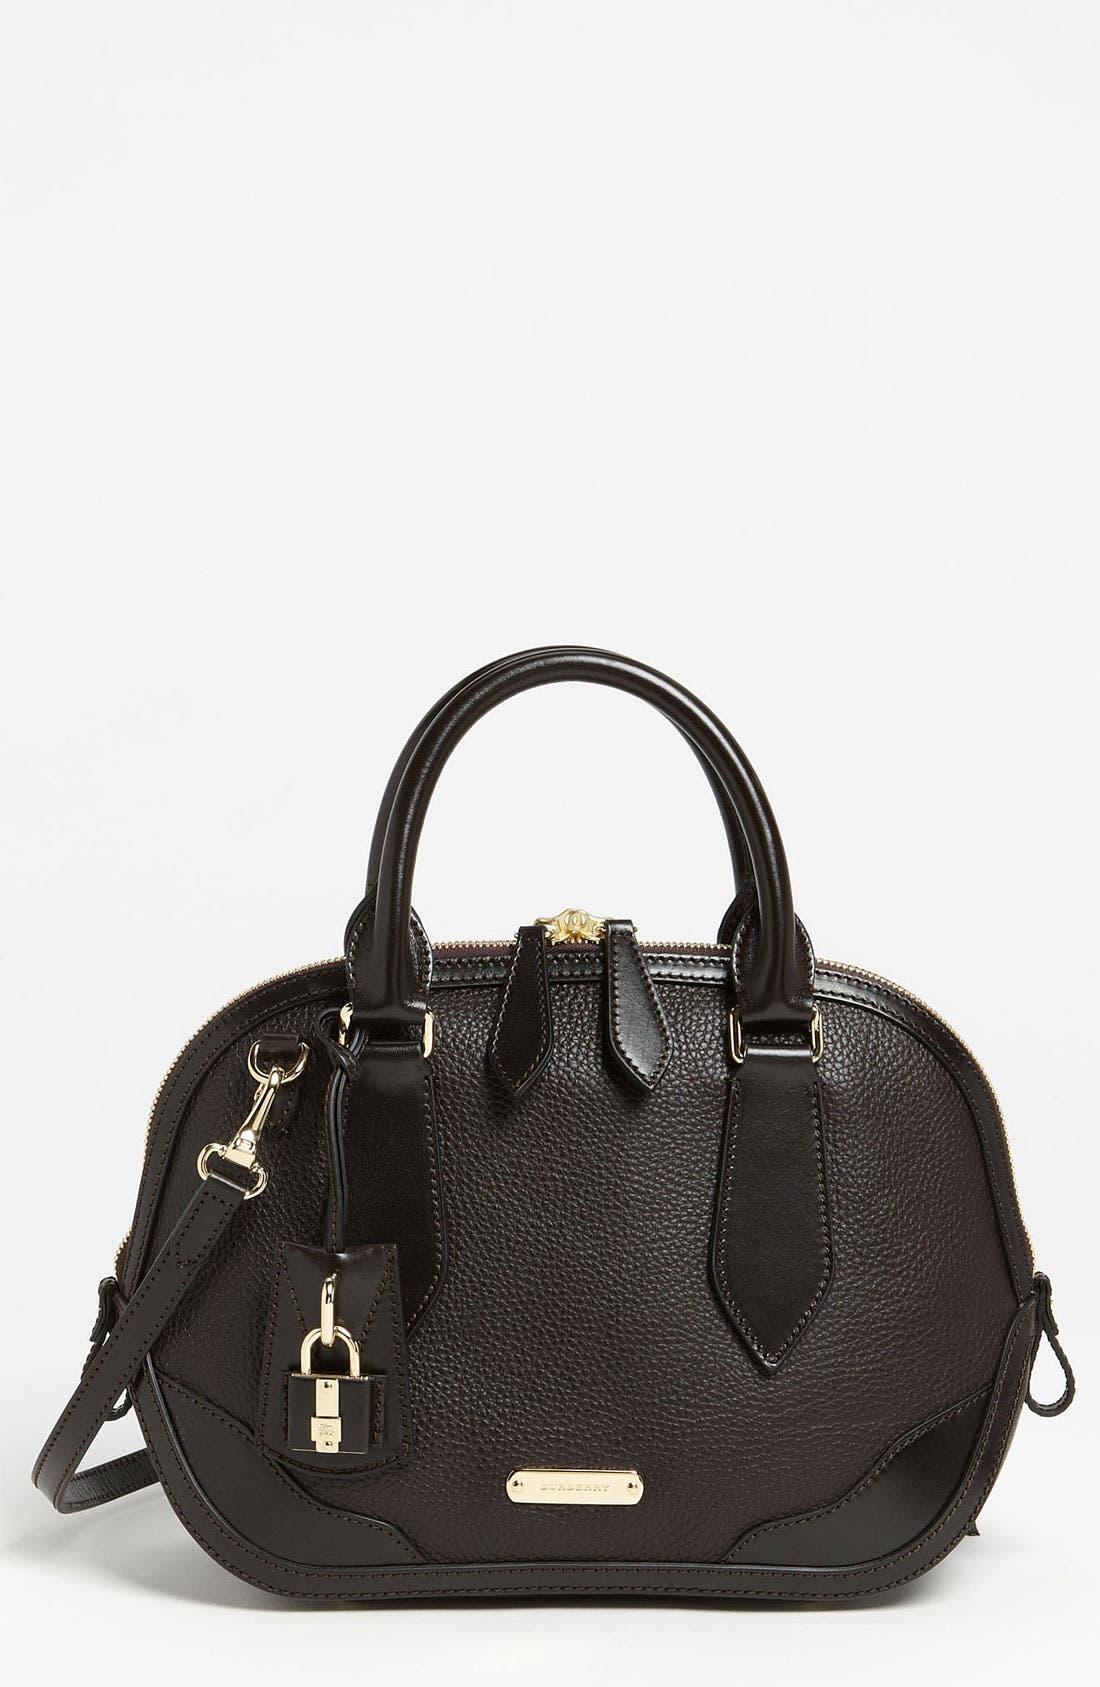 Main Image - Burberry 'London Grainy' Leather Satchel